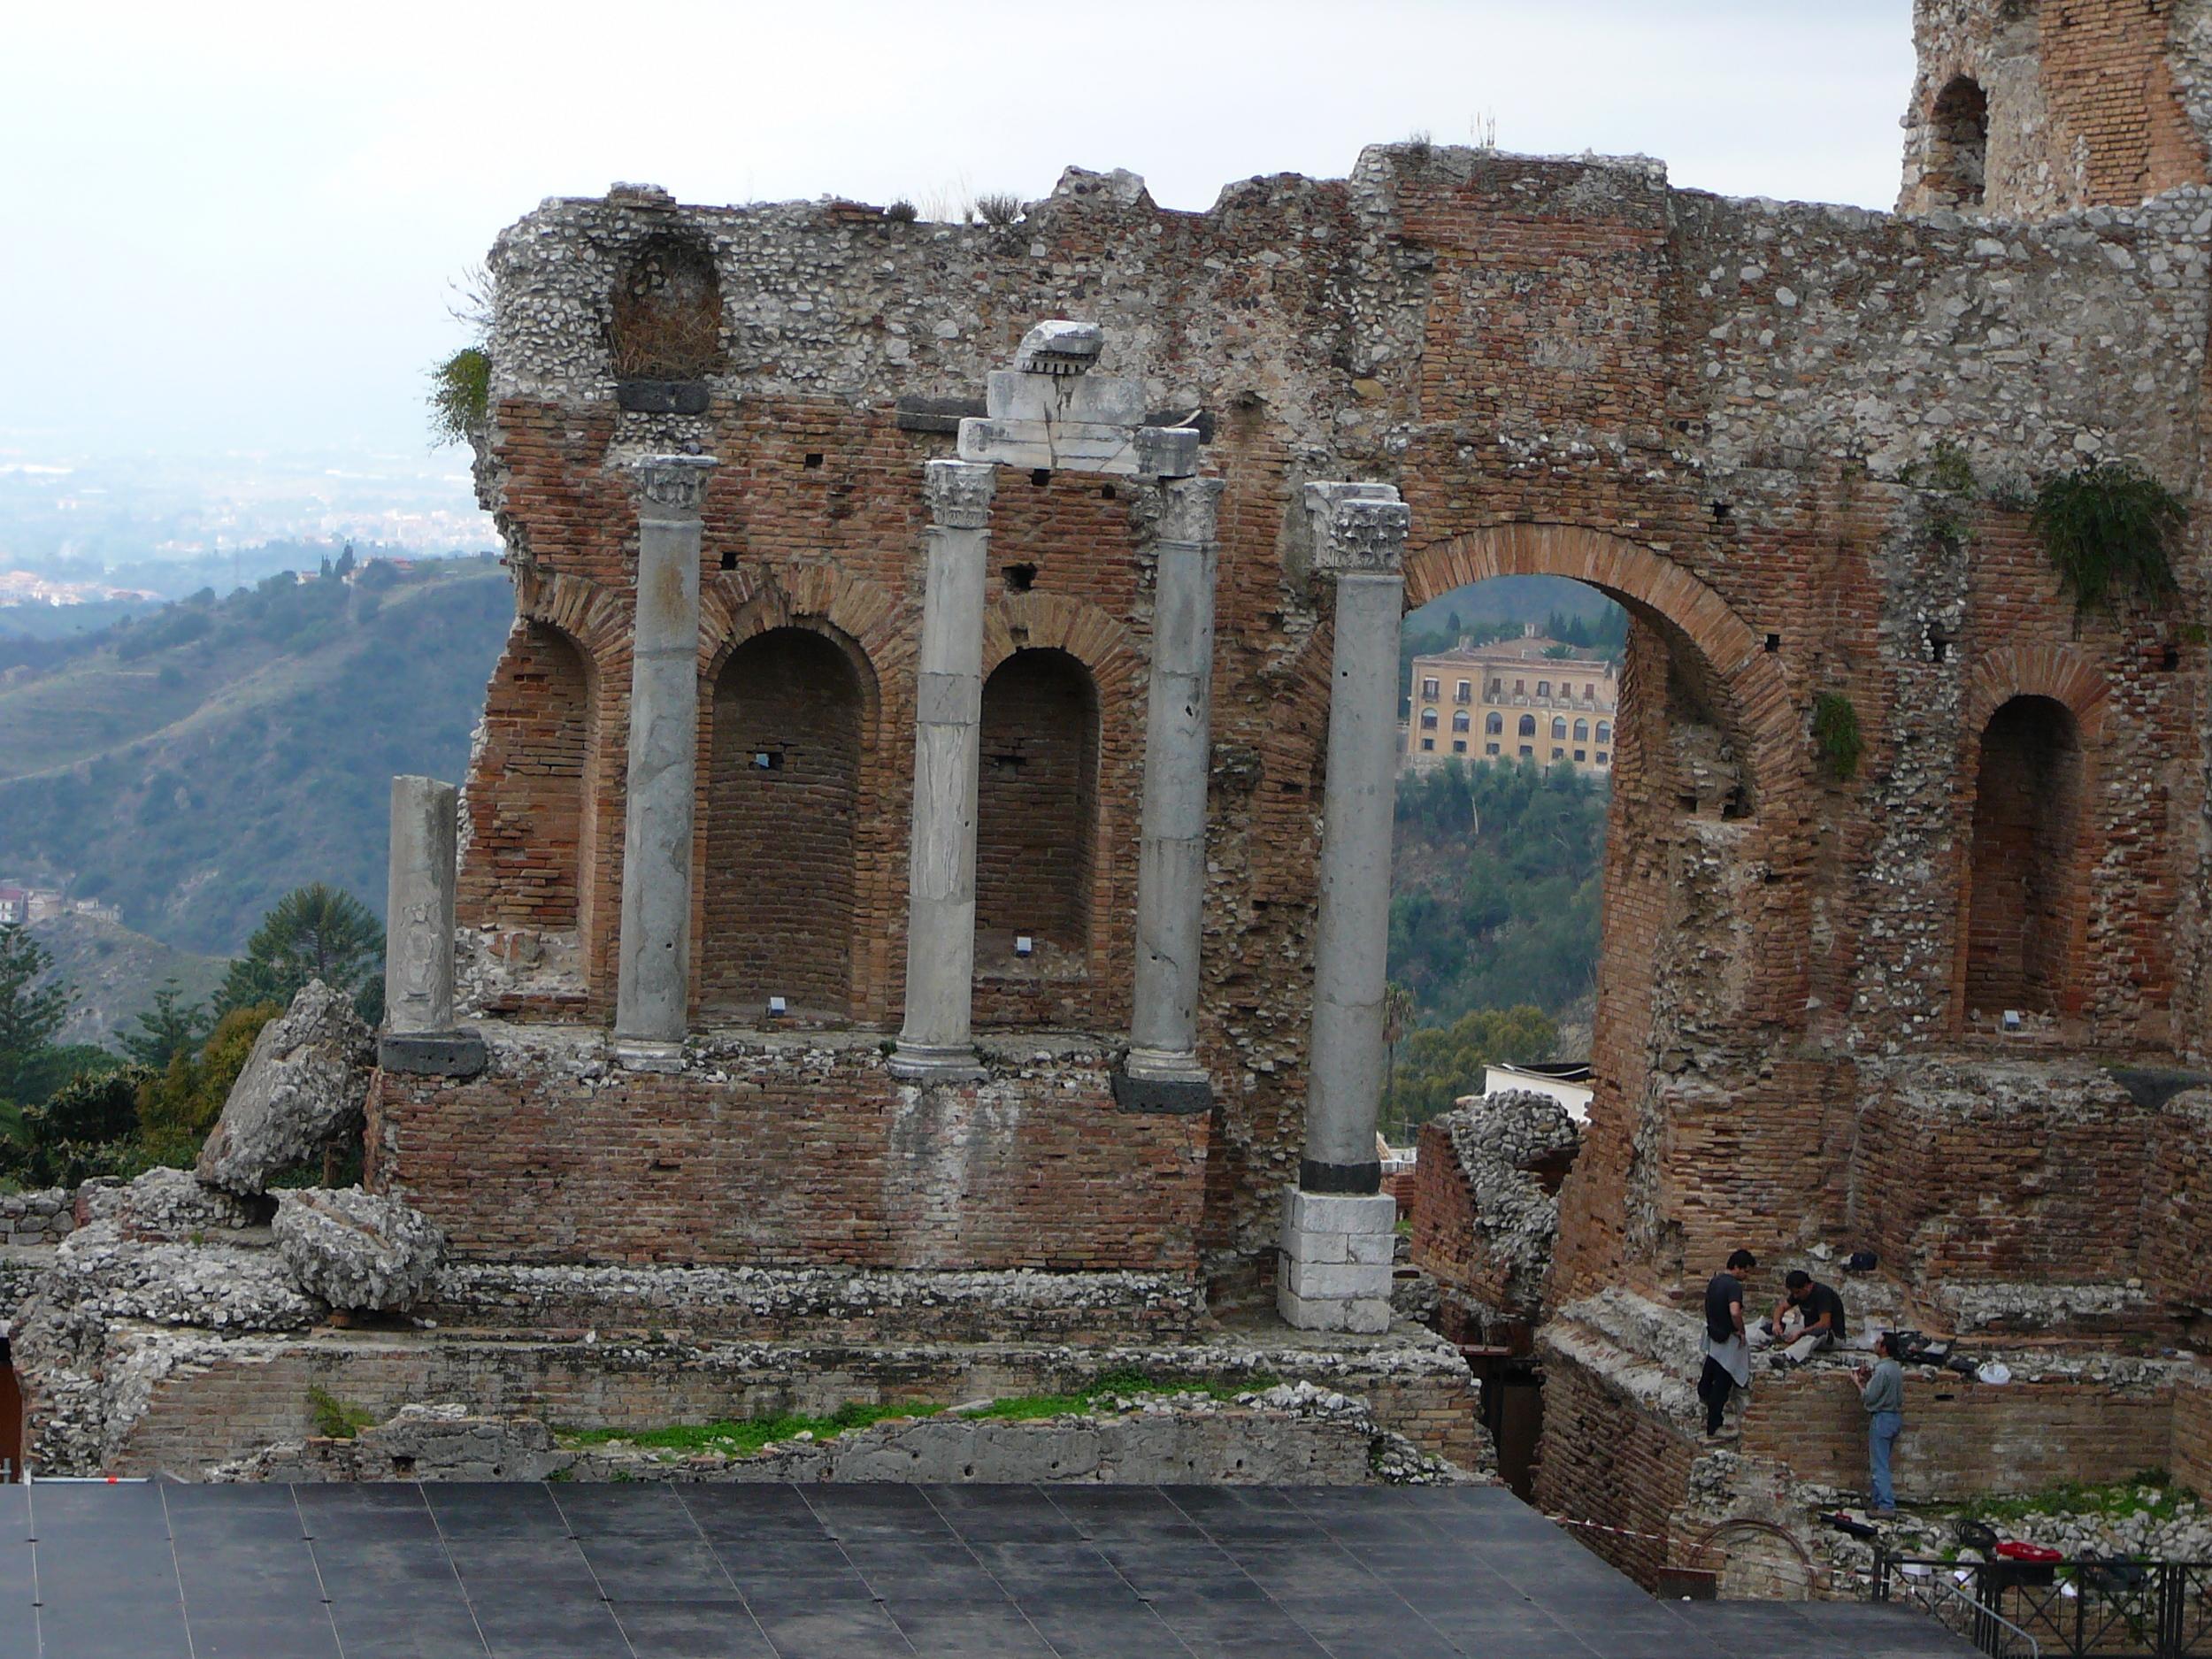 CRO Italy web 2008 - 10.JPG